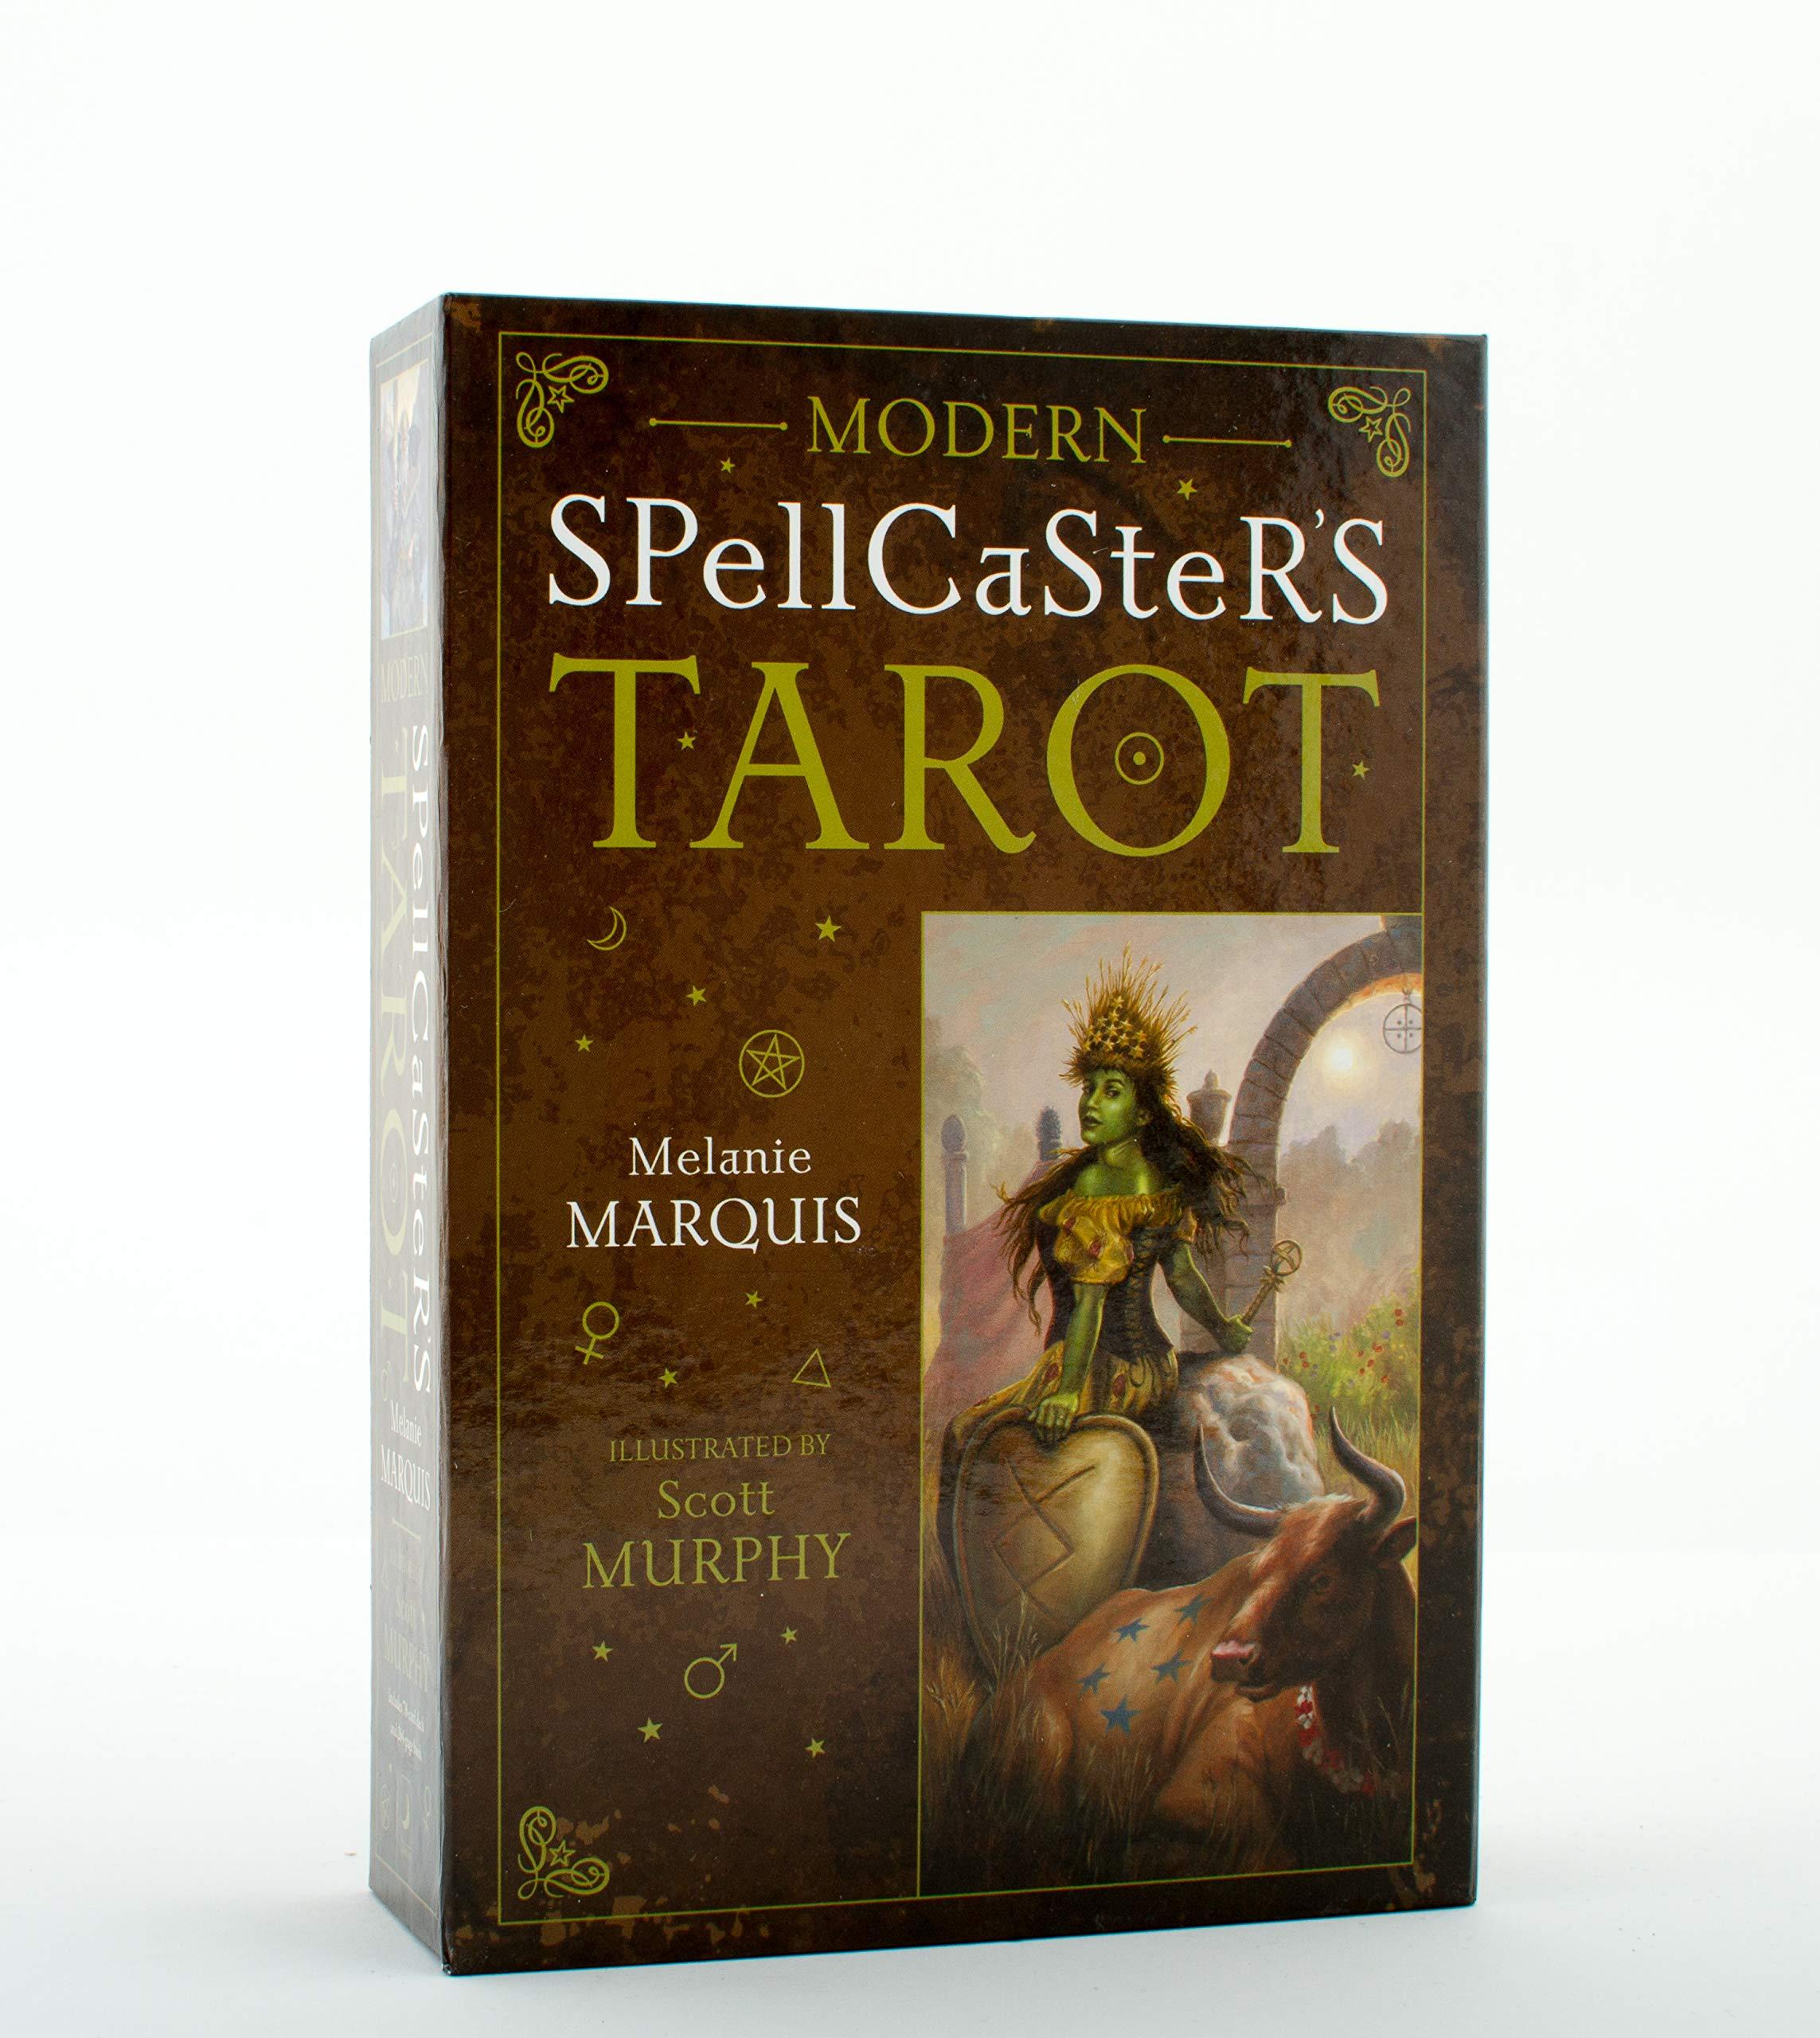 Modern Spellcaster's Tarot Review